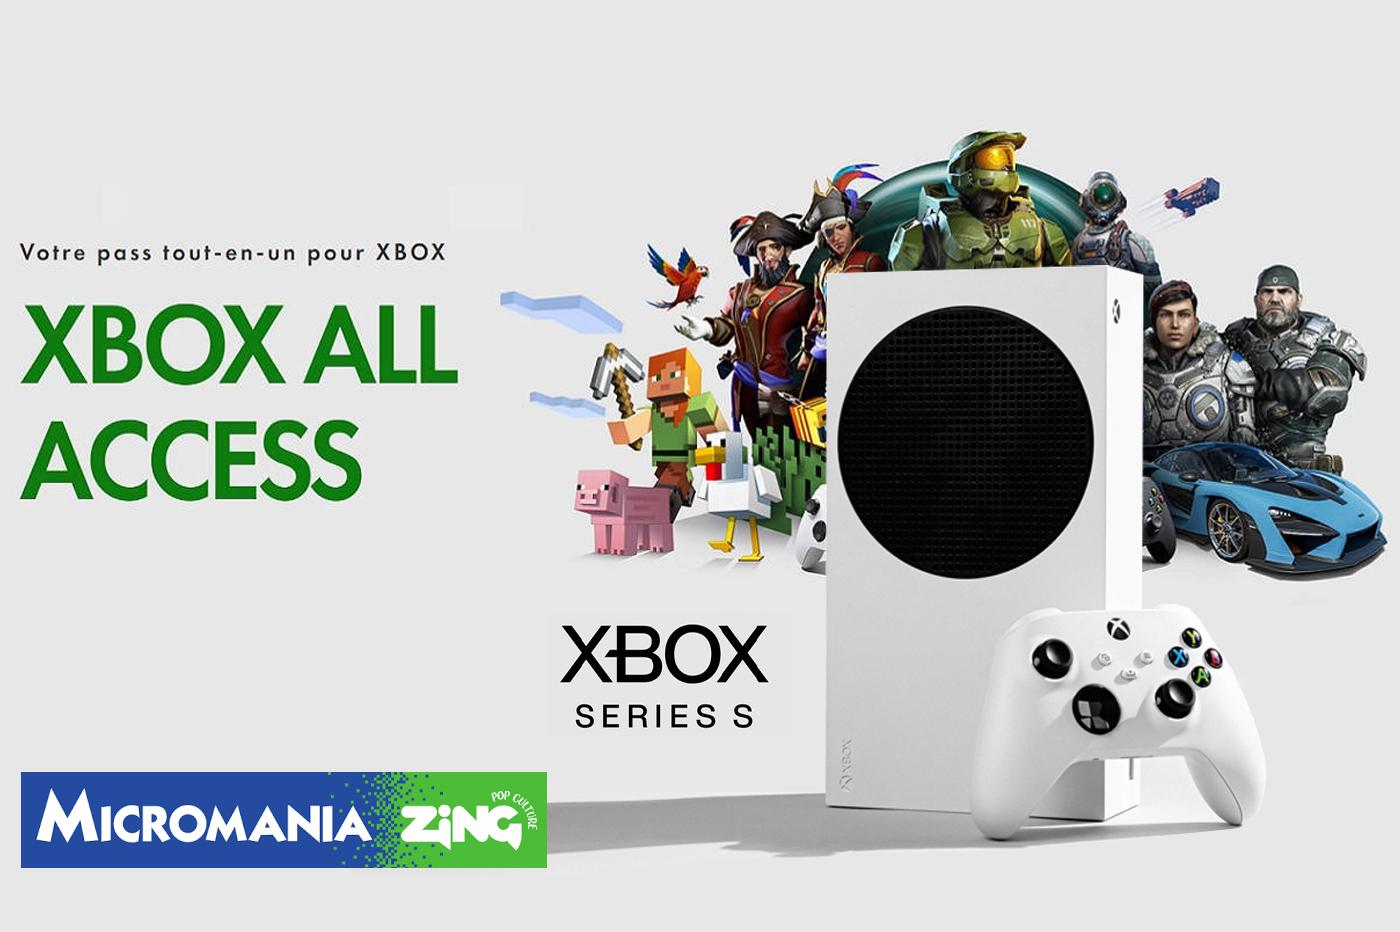 Xbox All Access Xbox Series S